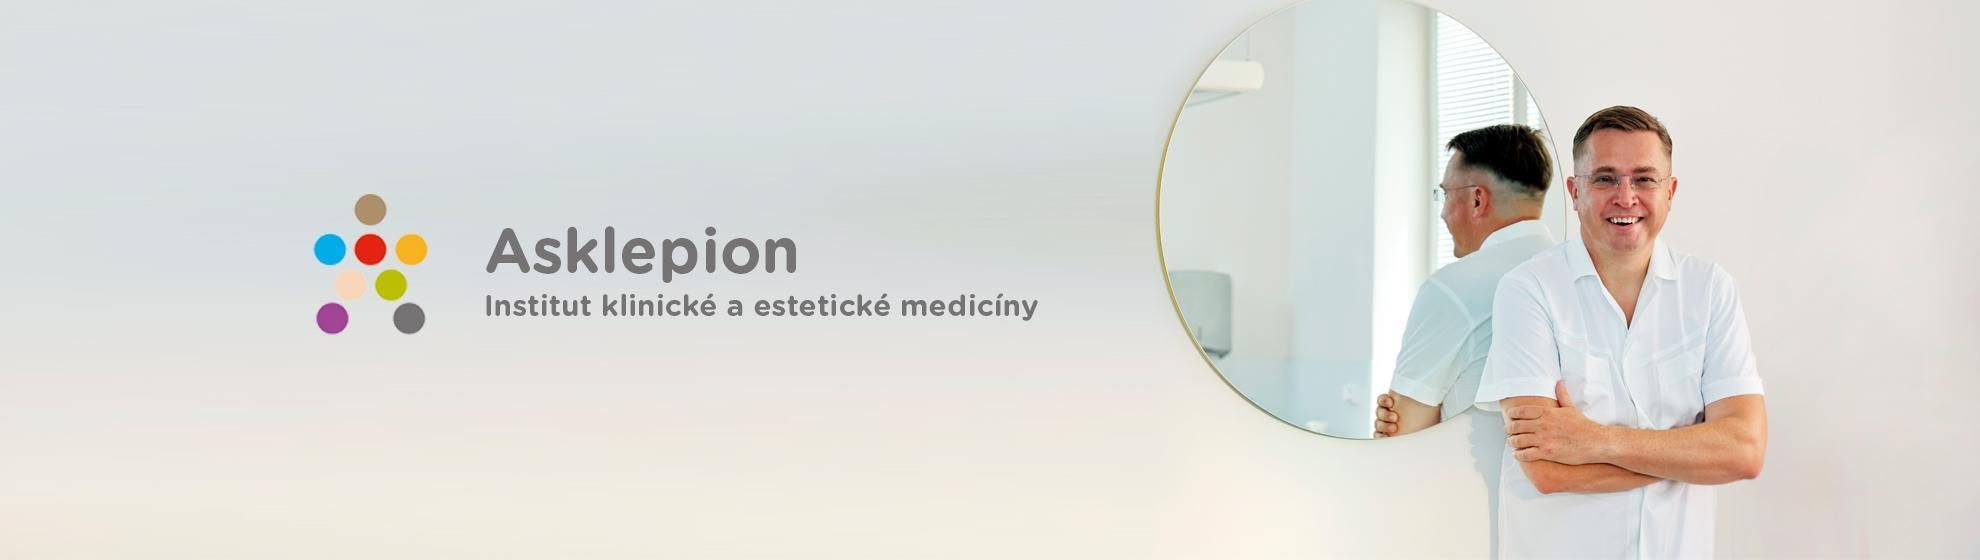 doc. MUDr. Roman Šmucler CSc.